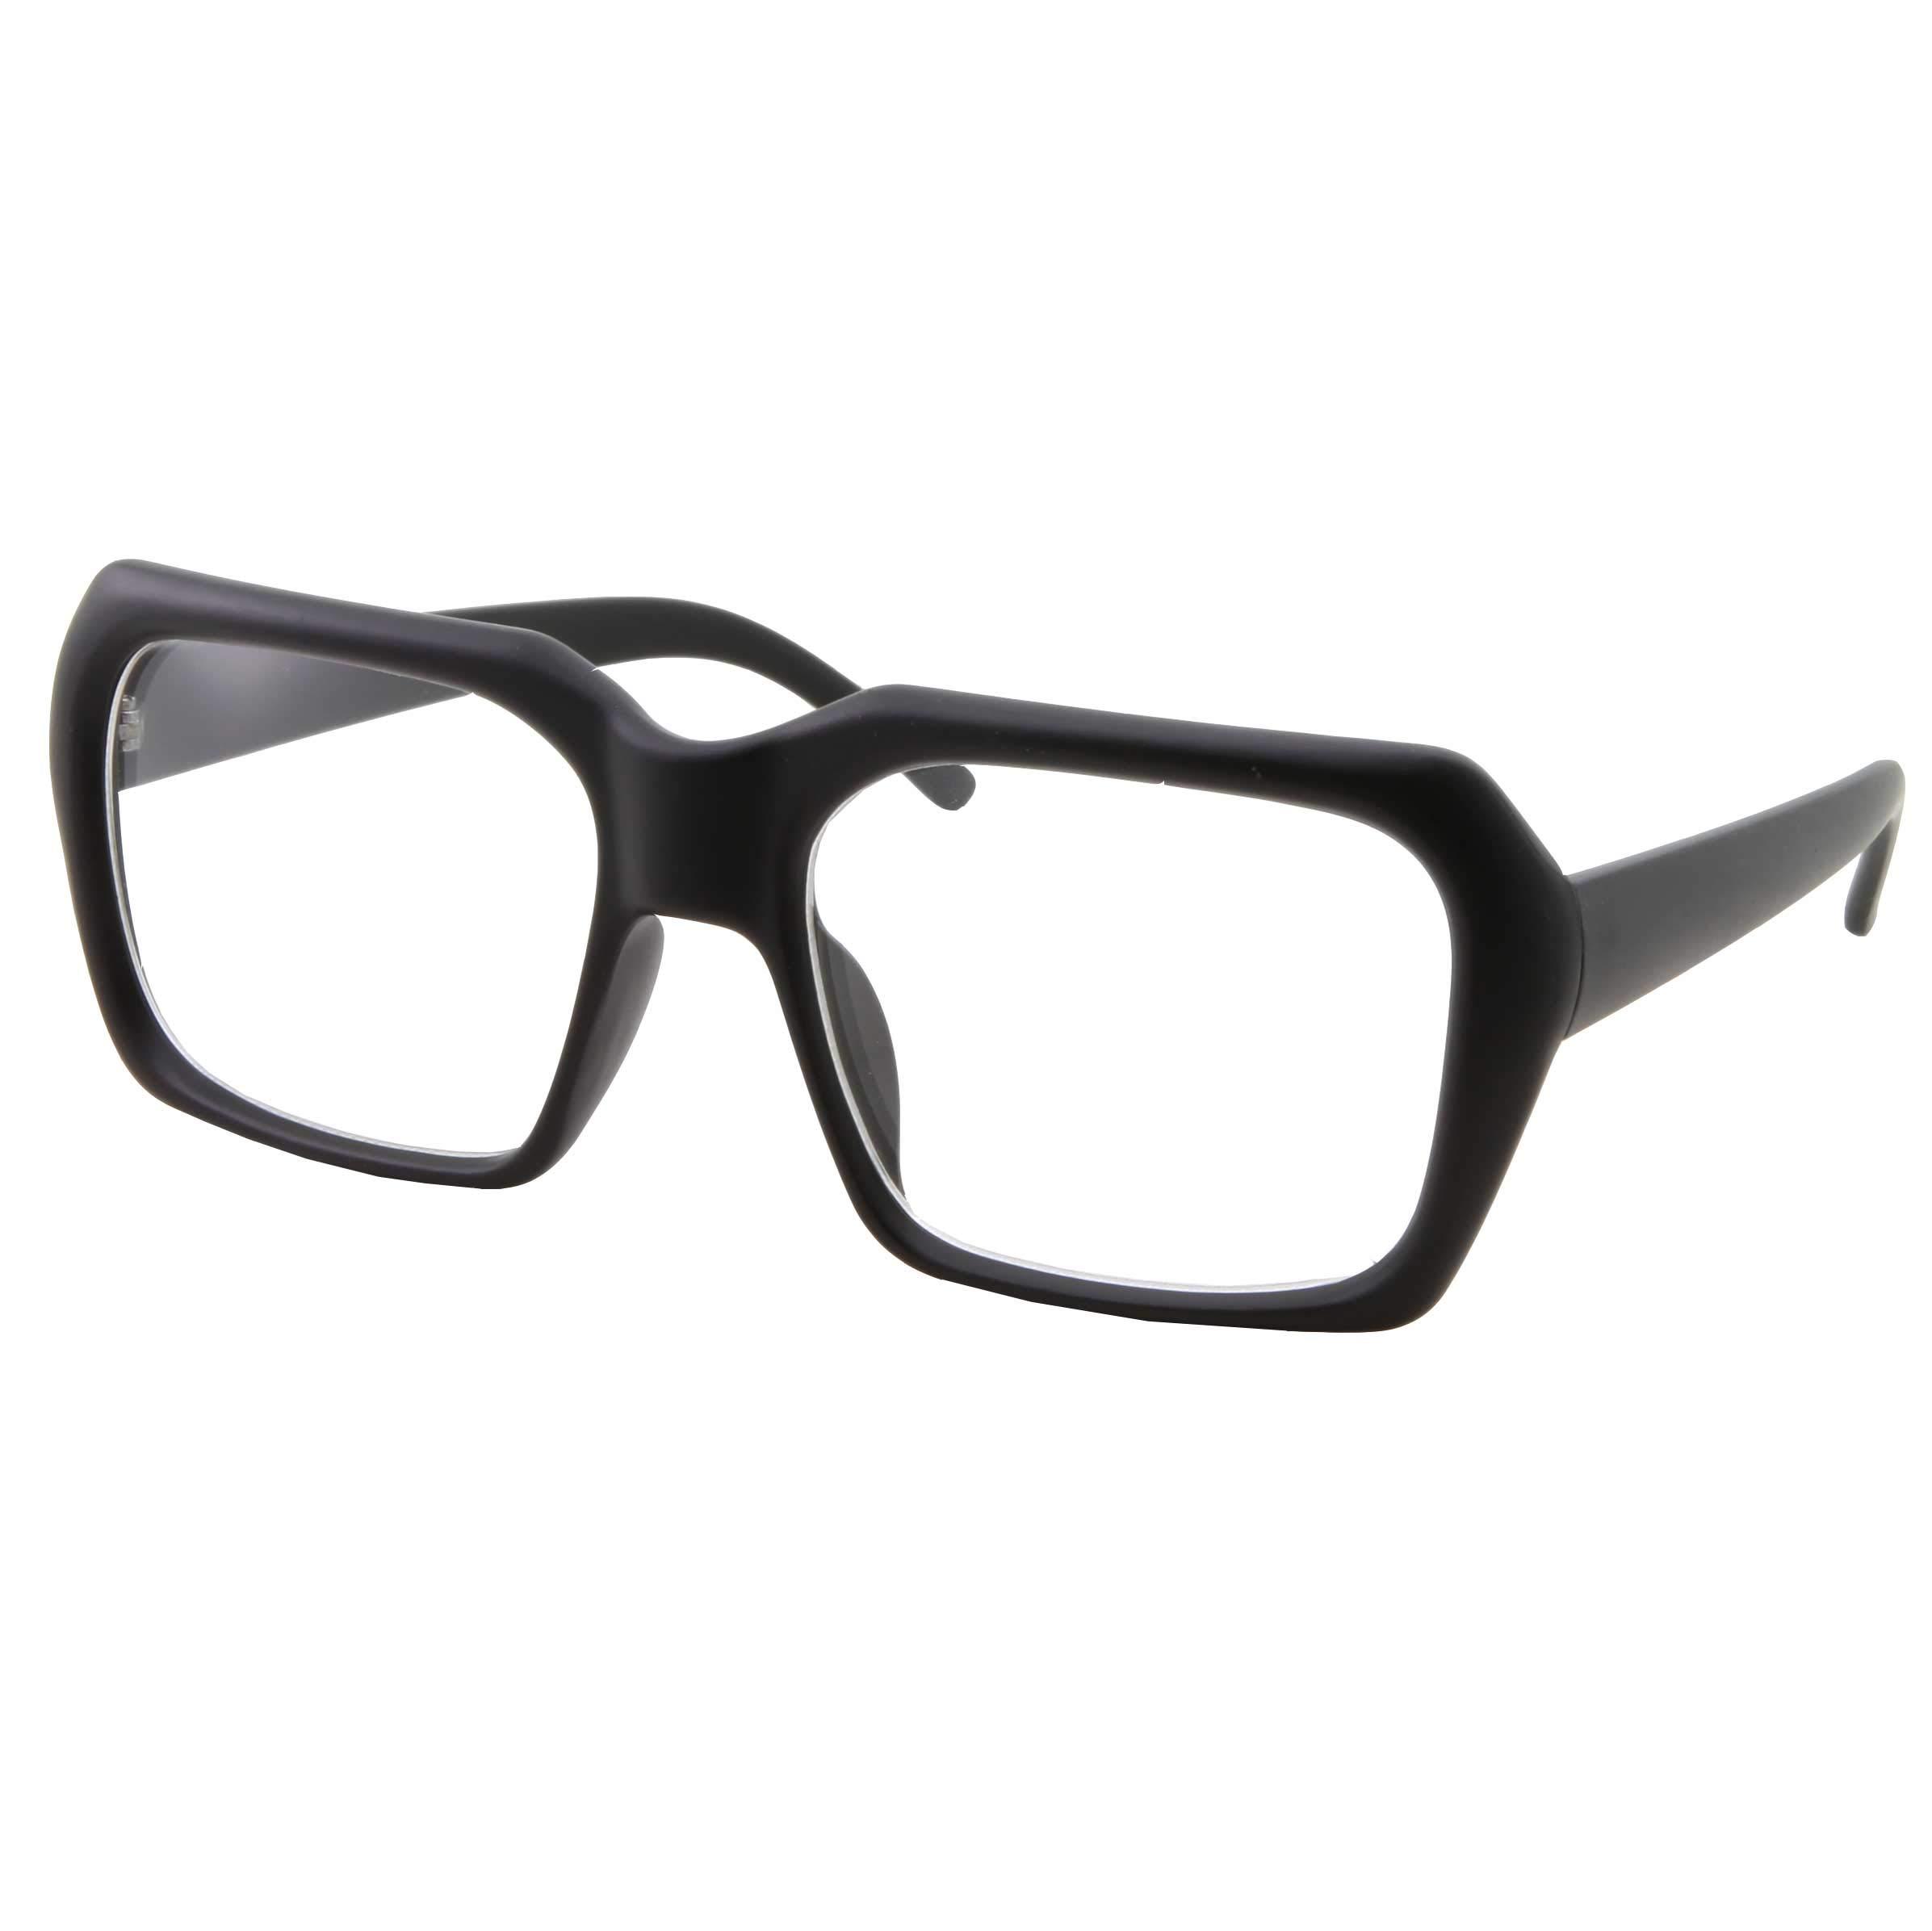 4de86d92ab66 XL Oversized Black Nerd Clear Glasses - Men and Women - Square Costume  (Matte Black)